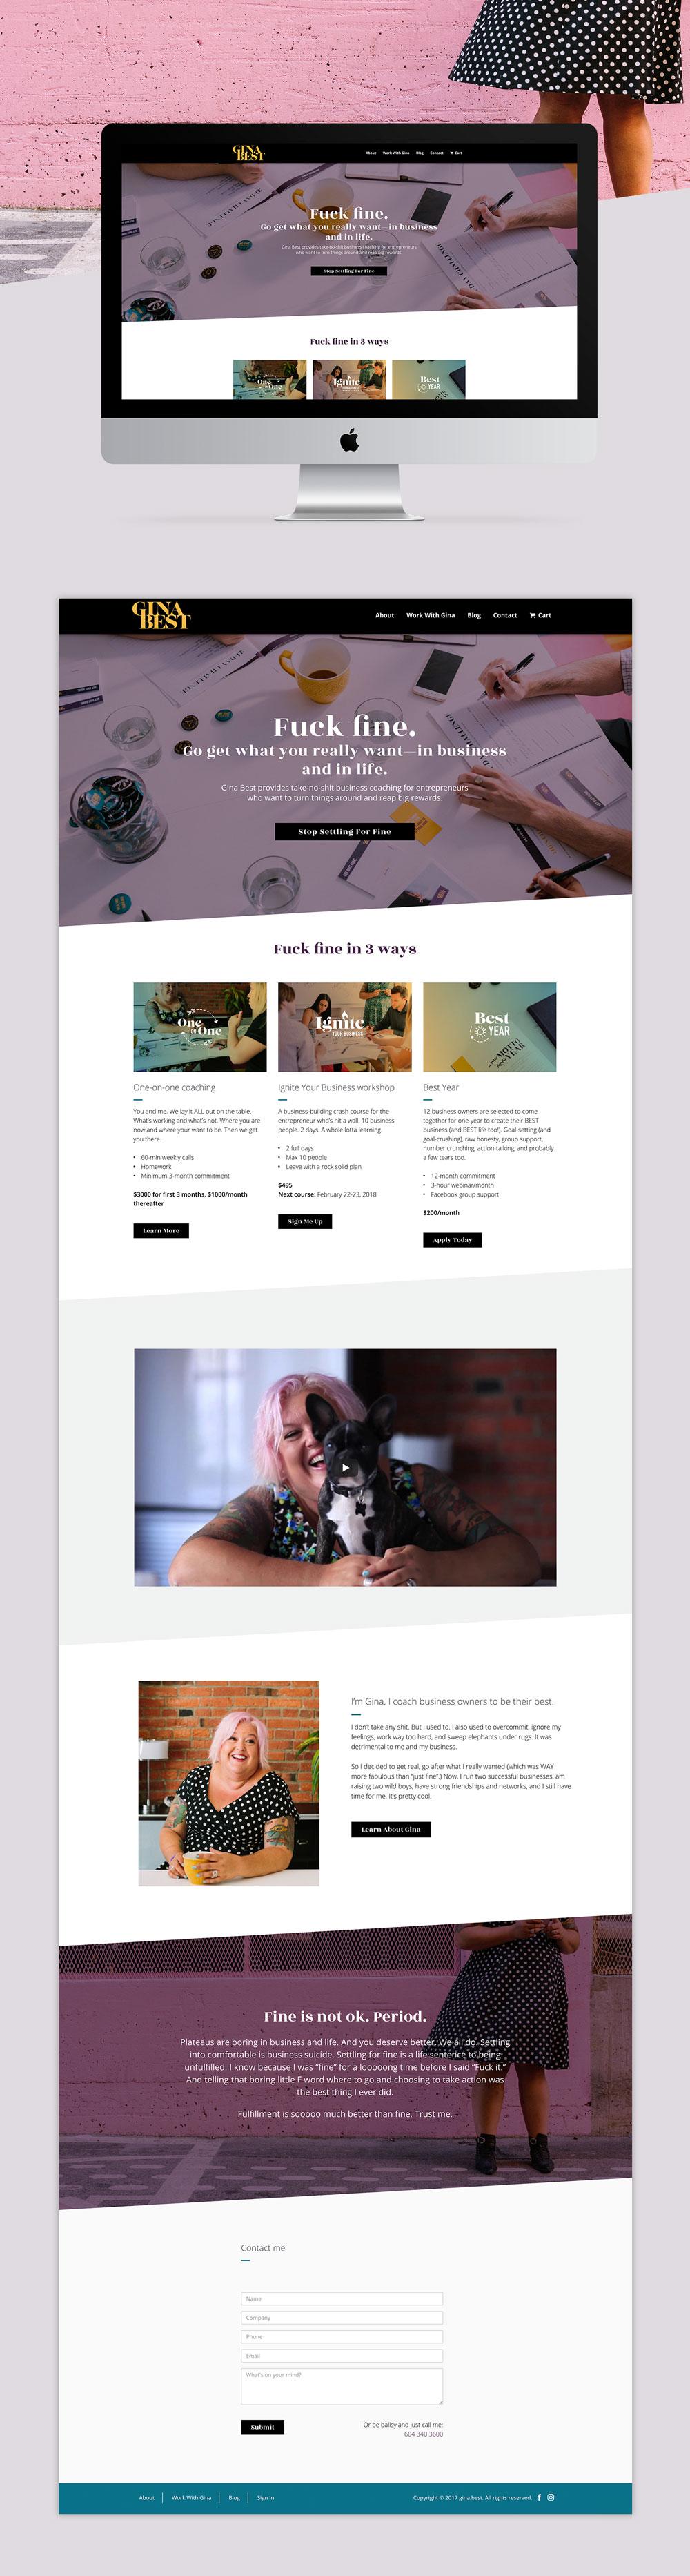 Web design by Vancouver designer, Jennifer Miranda Grigor //  jennifer-miranda.com